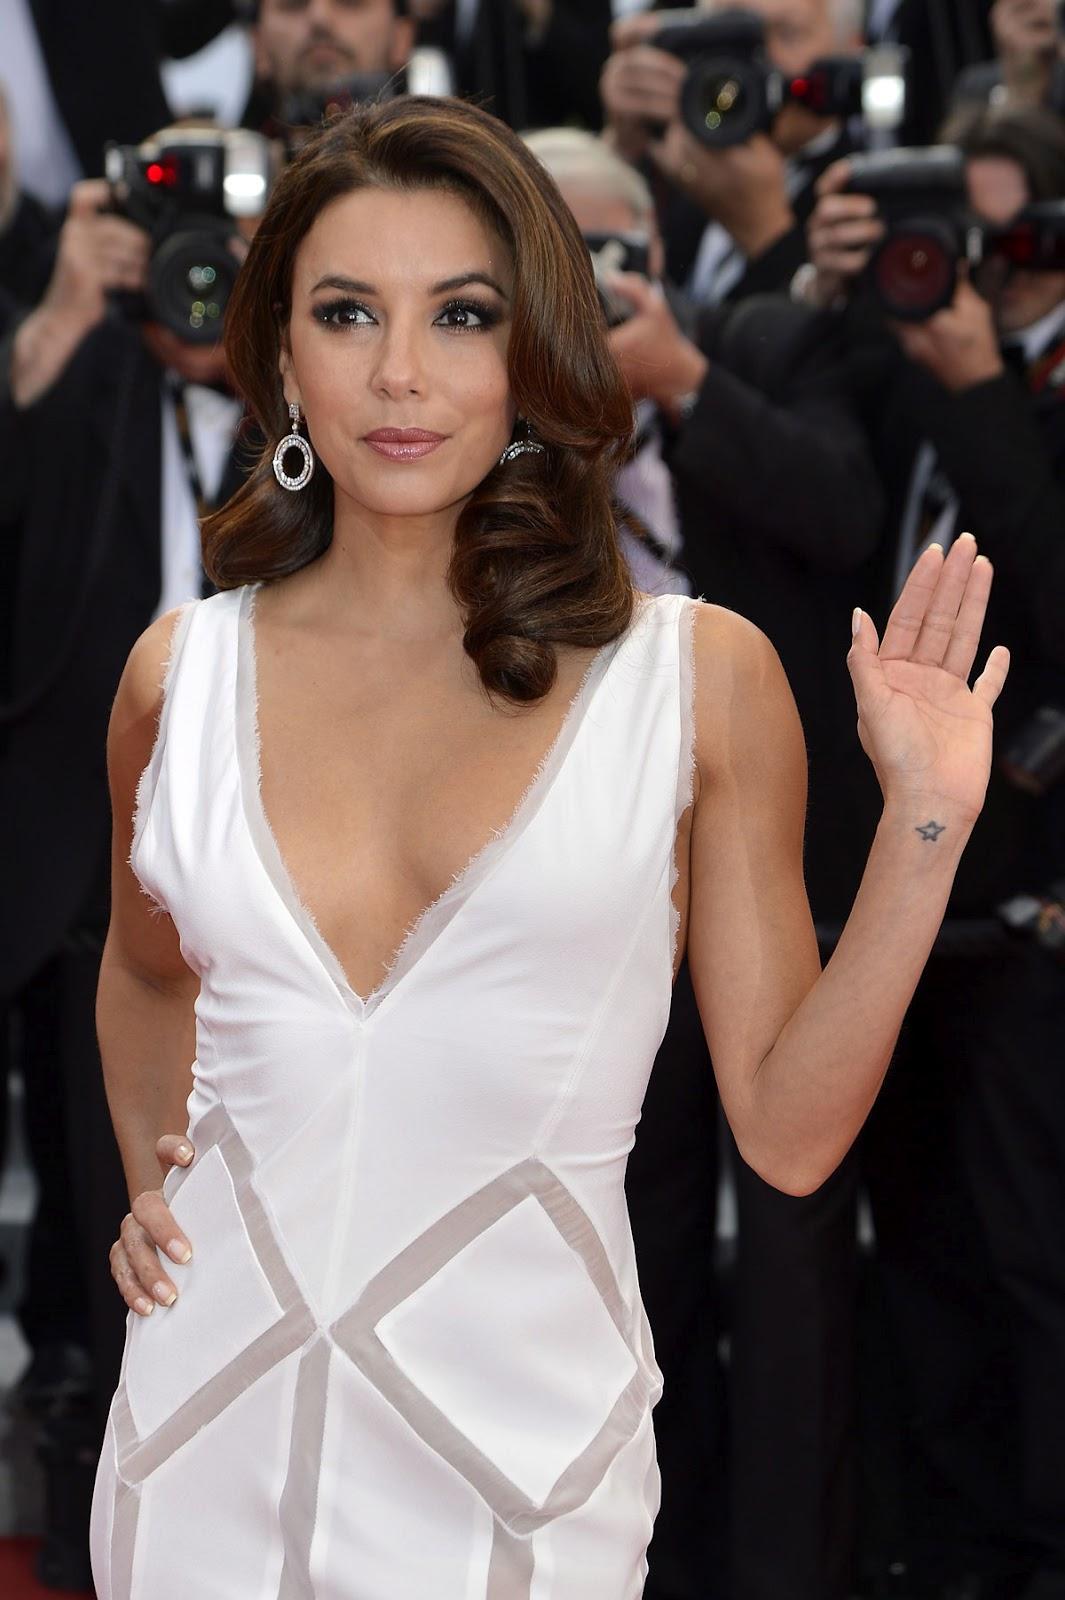 http://1.bp.blogspot.com/-cxJXkq7iiaM/T7VjYPBCgiI/AAAAAAAAFk4/6eqPDr37jAs/s1600/EVA-LONGORIA-De-Rouille-et-Dos-Premiere-Cannes-Film-Festival-2012-04.jpg